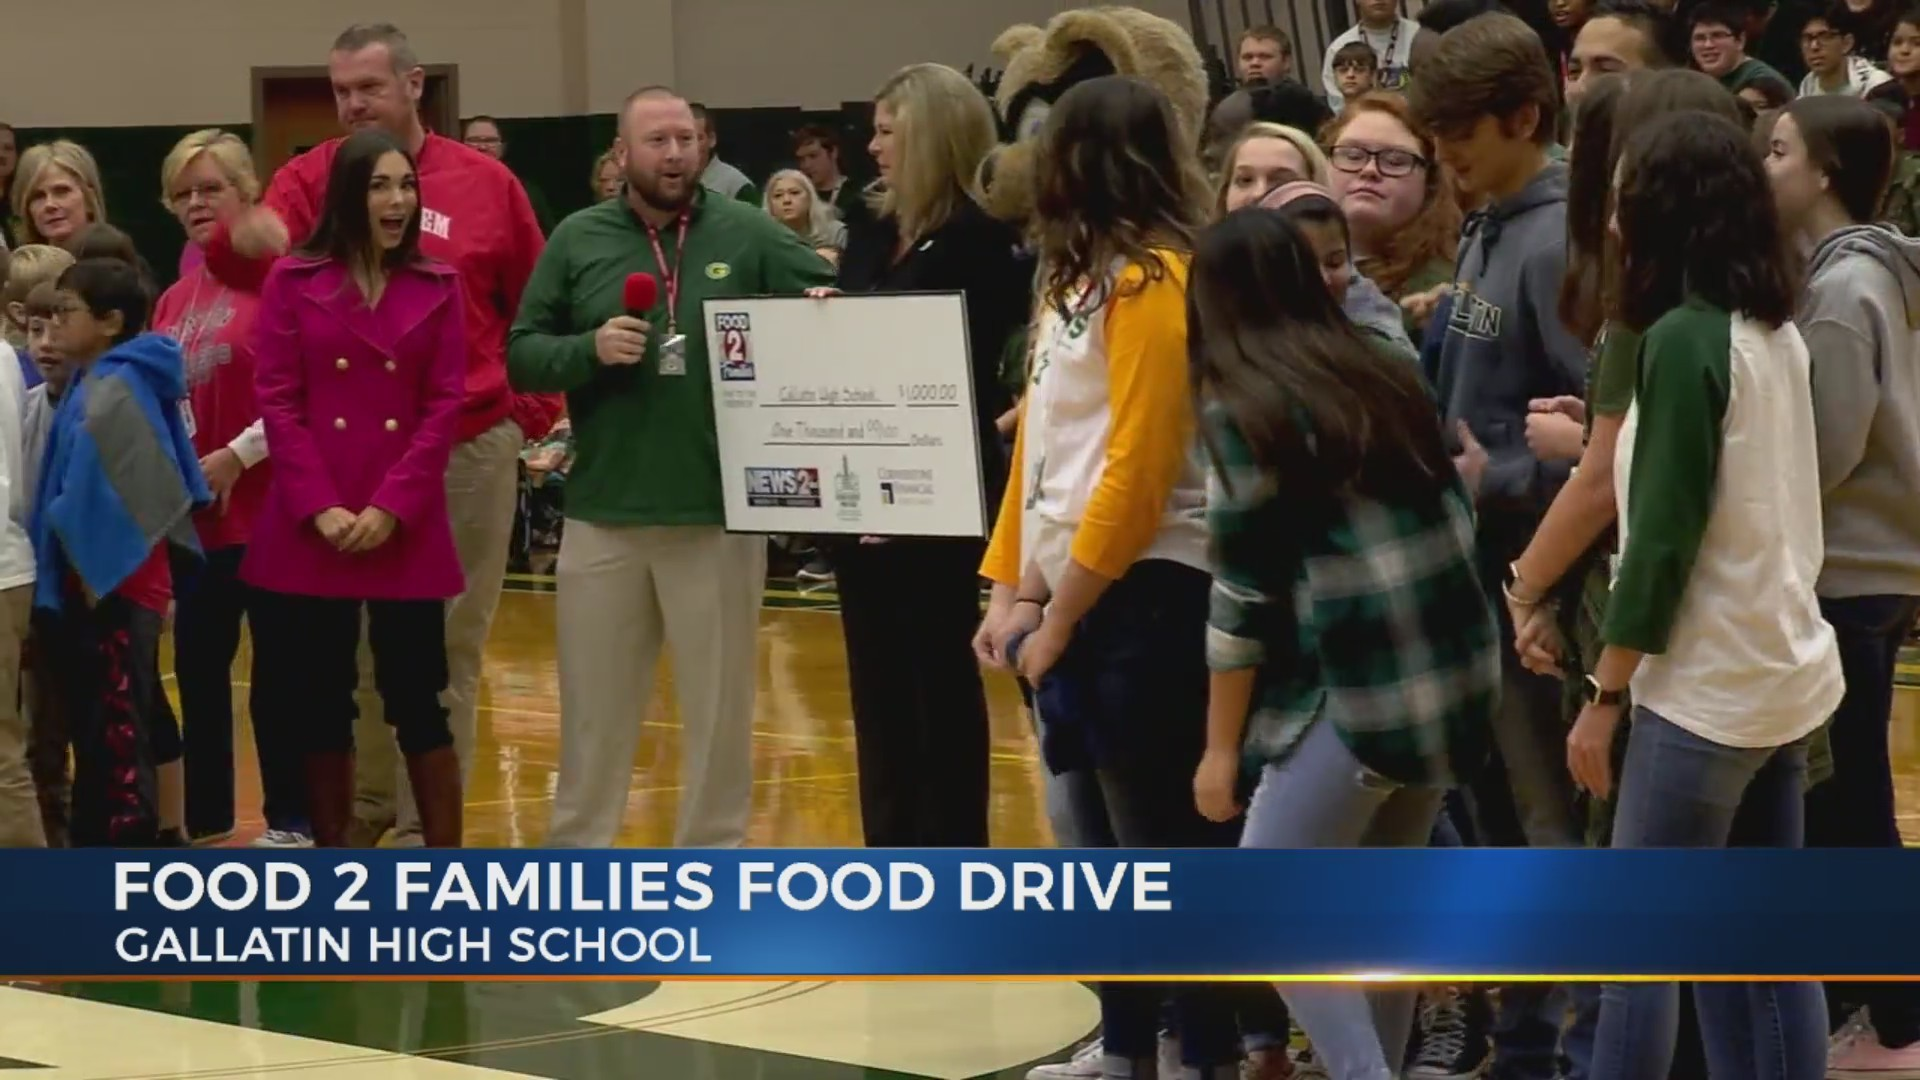 Gallatin_High_School_wins_Food_2_Familie_0_20181205013621